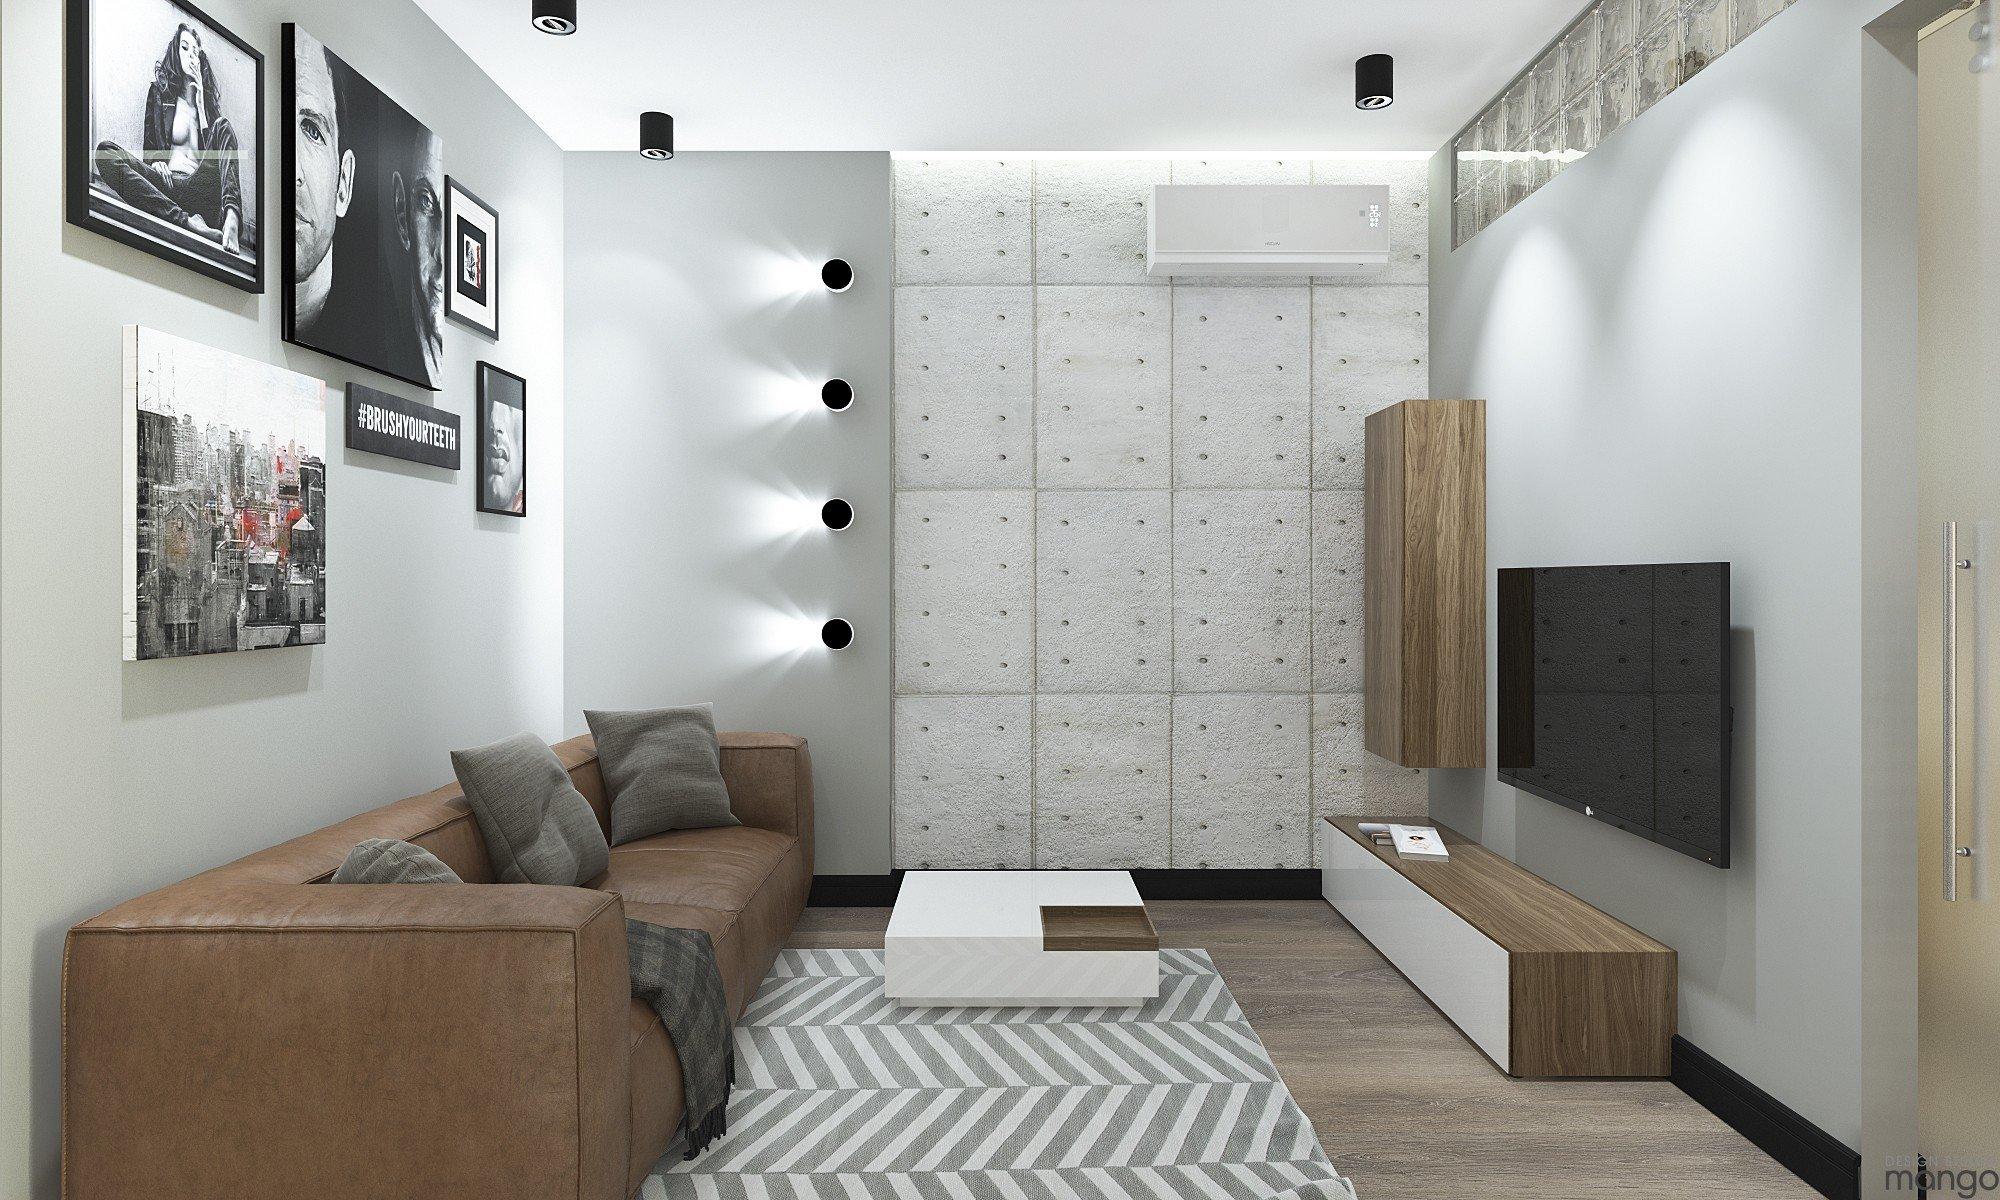 Minimalist Small Living Room Ideas Luxury Types Of 3 Small Living Room Designs Bined Between Modern and Minimalist Interior Decor Ideas